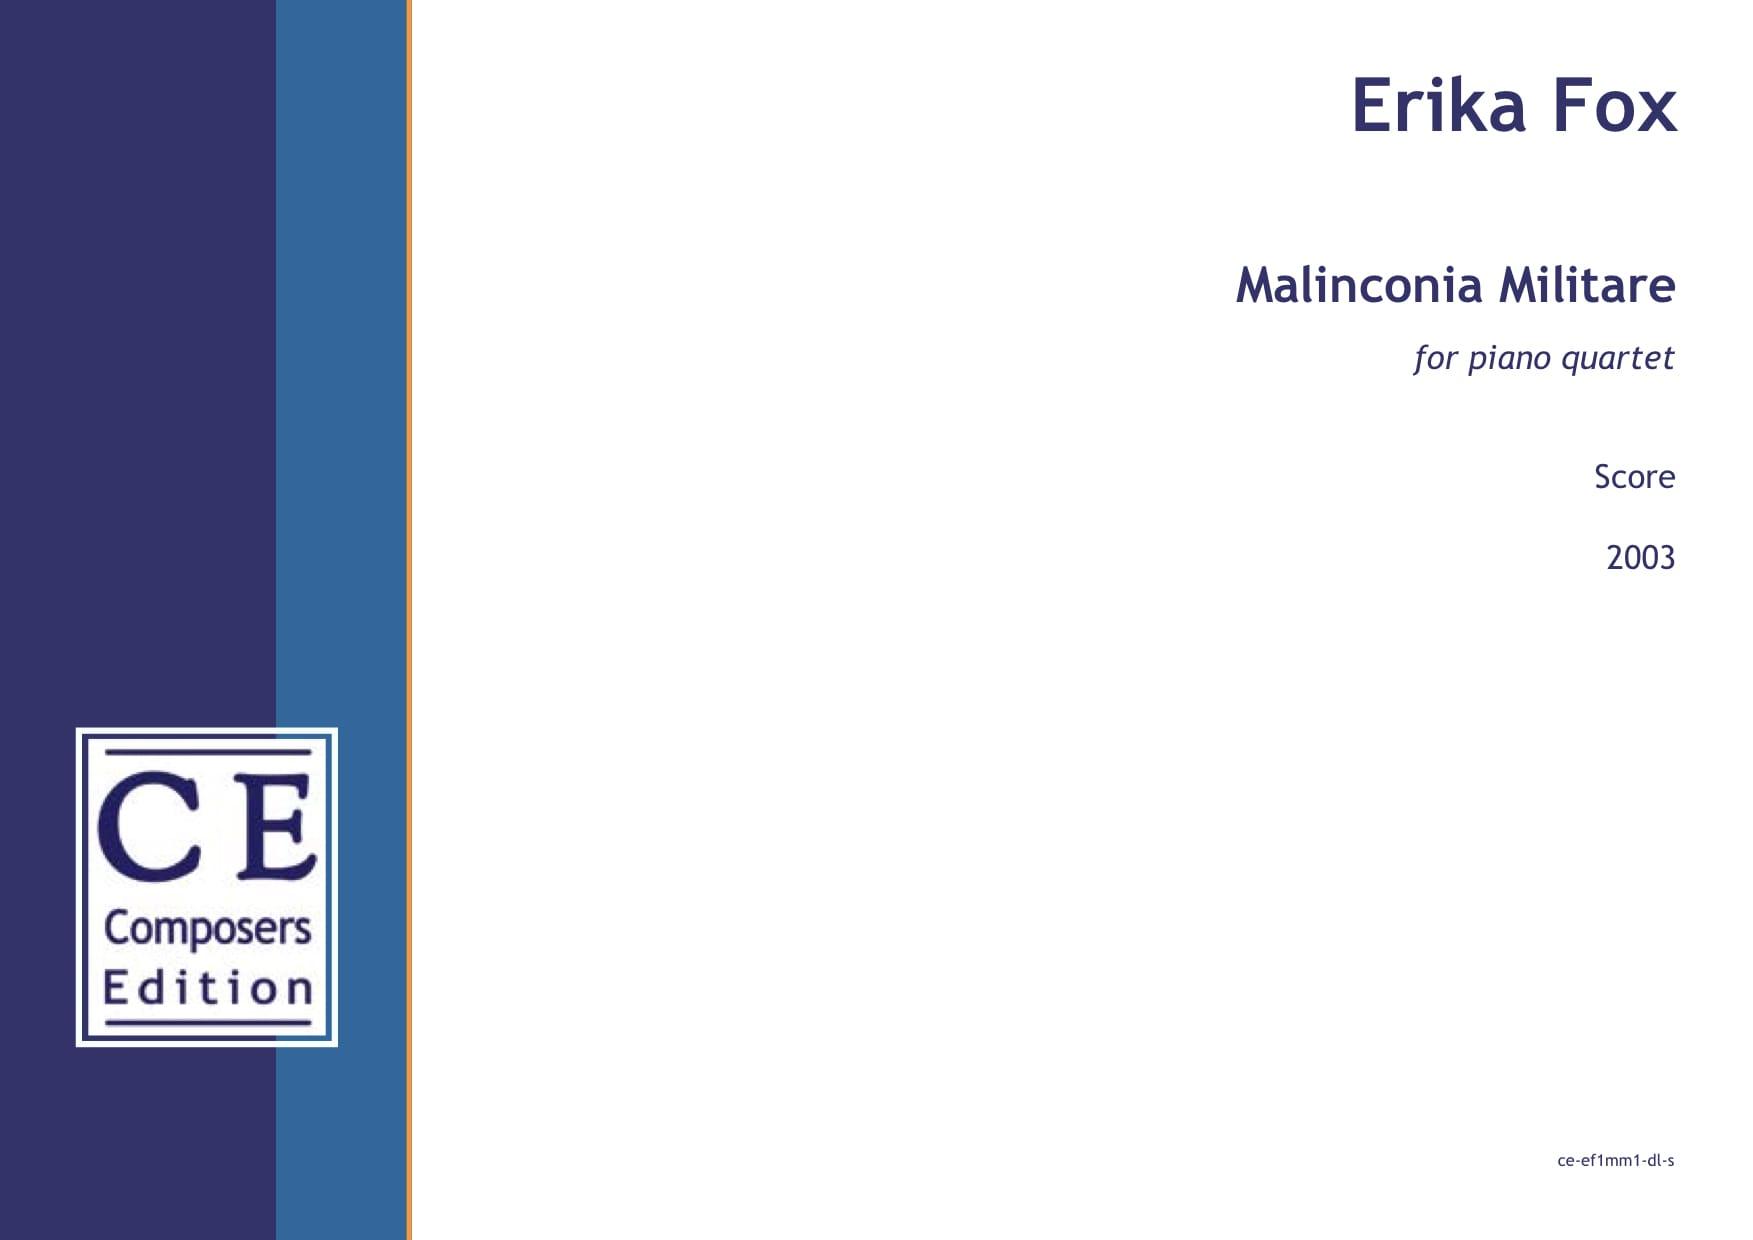 Erika Fox: Malinconia Militare for piano quartet